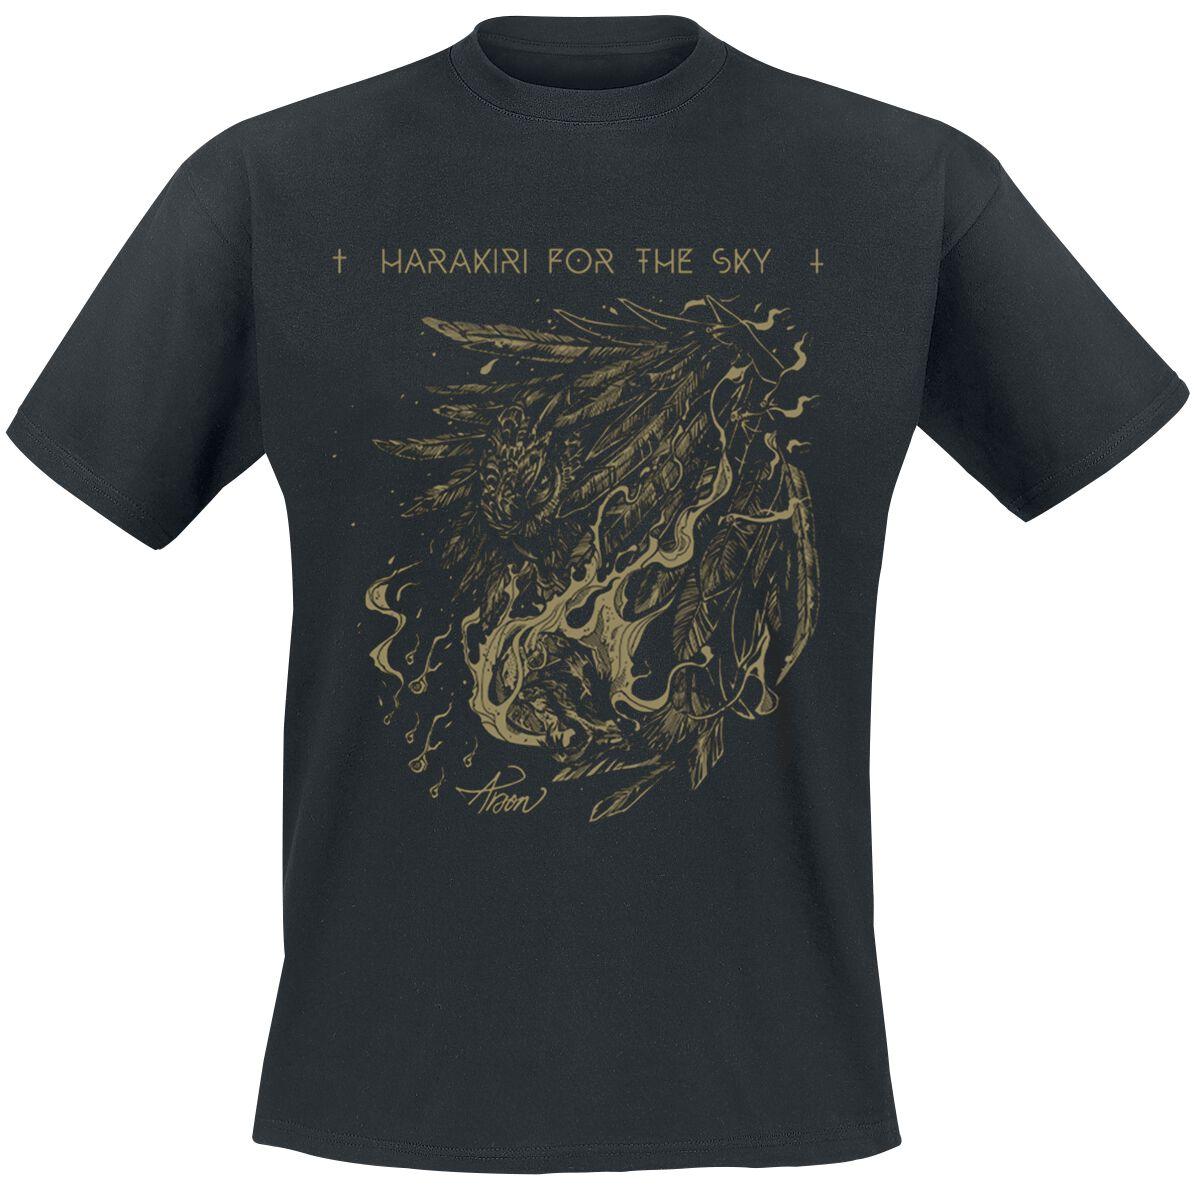 Zespoły - Koszulki - T-Shirt Harakiri For The Sky Arson Gold T-Shirt czarny - 373350